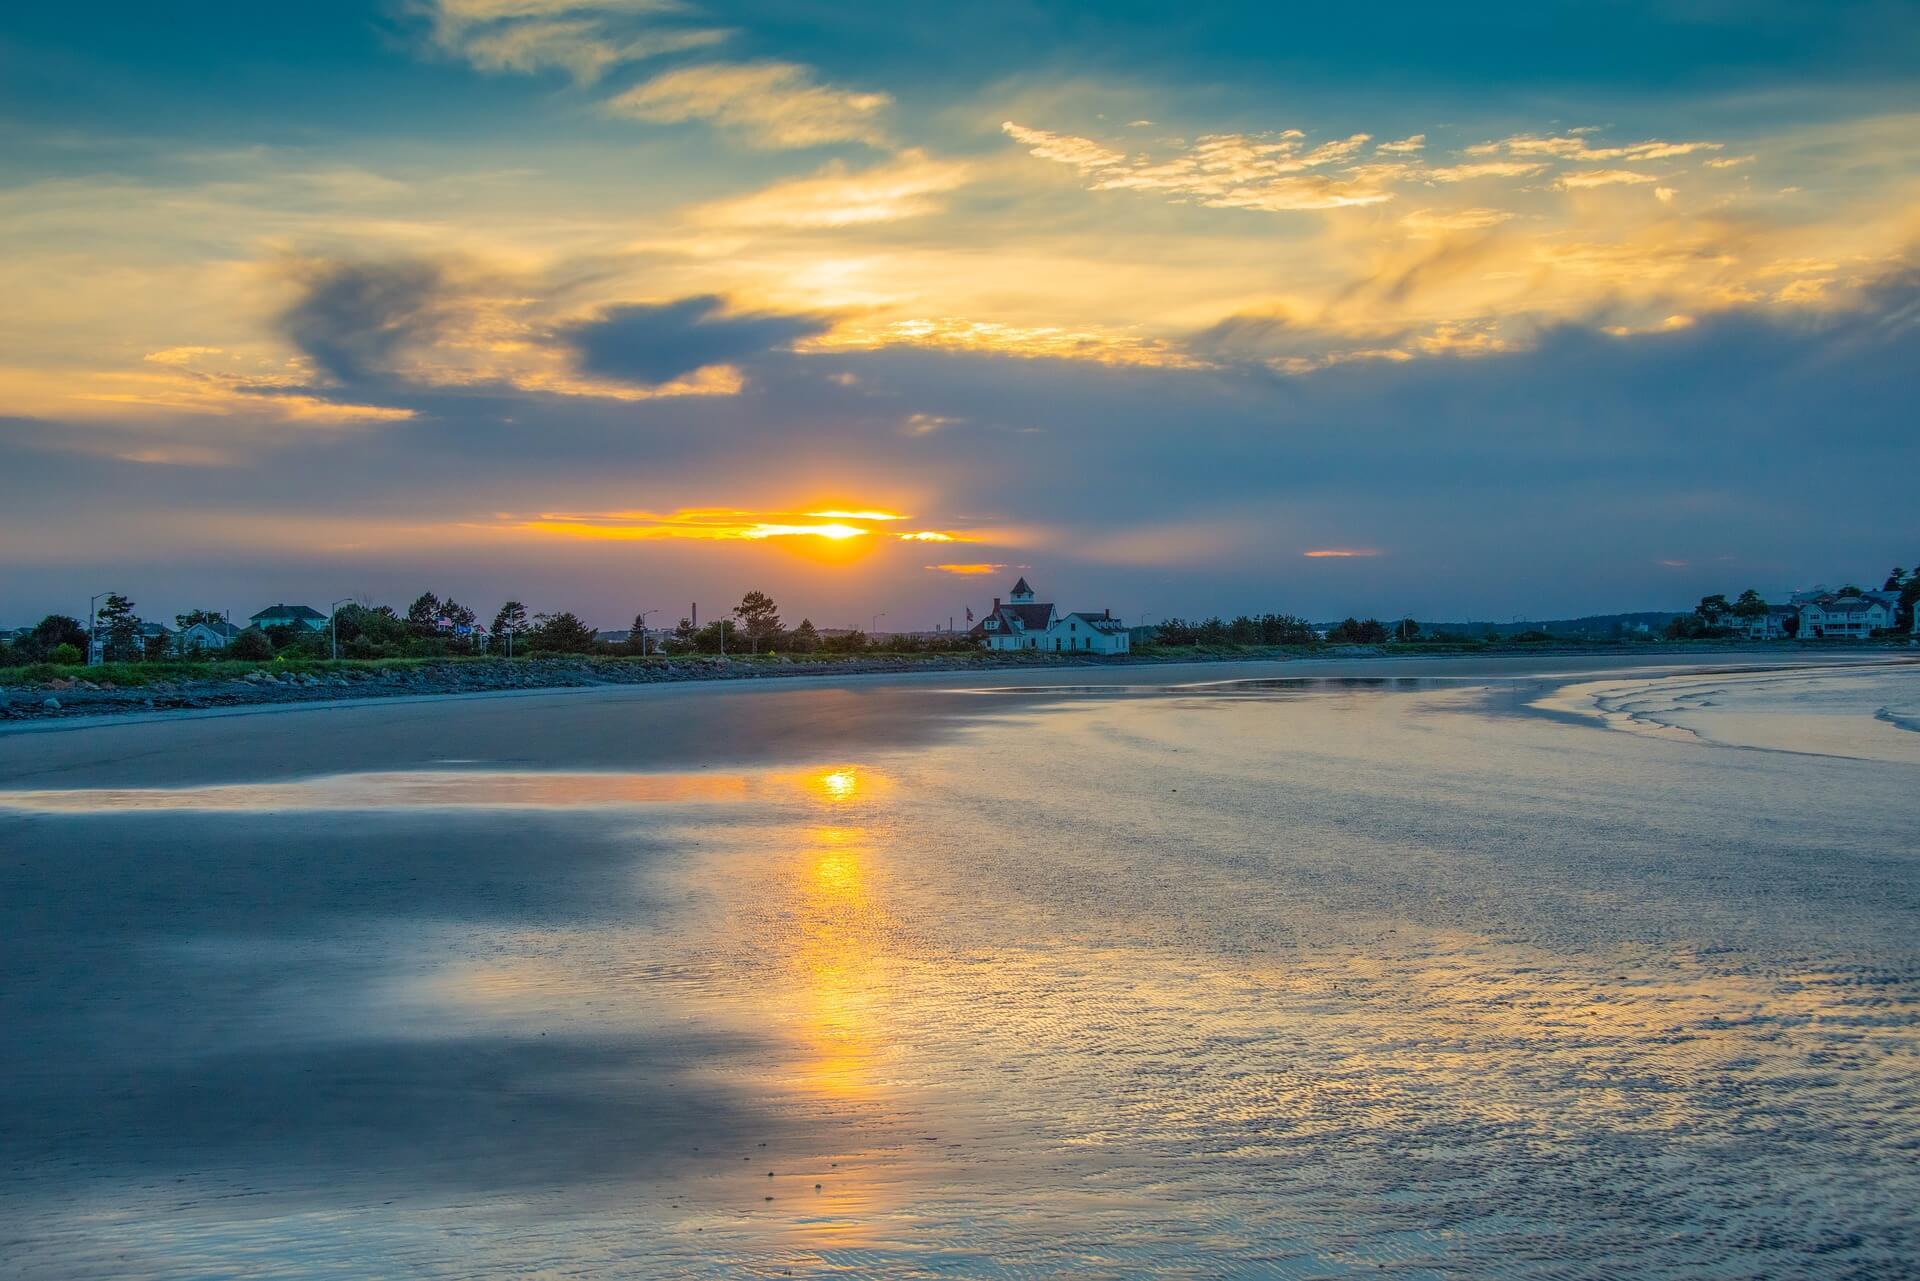 sunset-5000260_1920